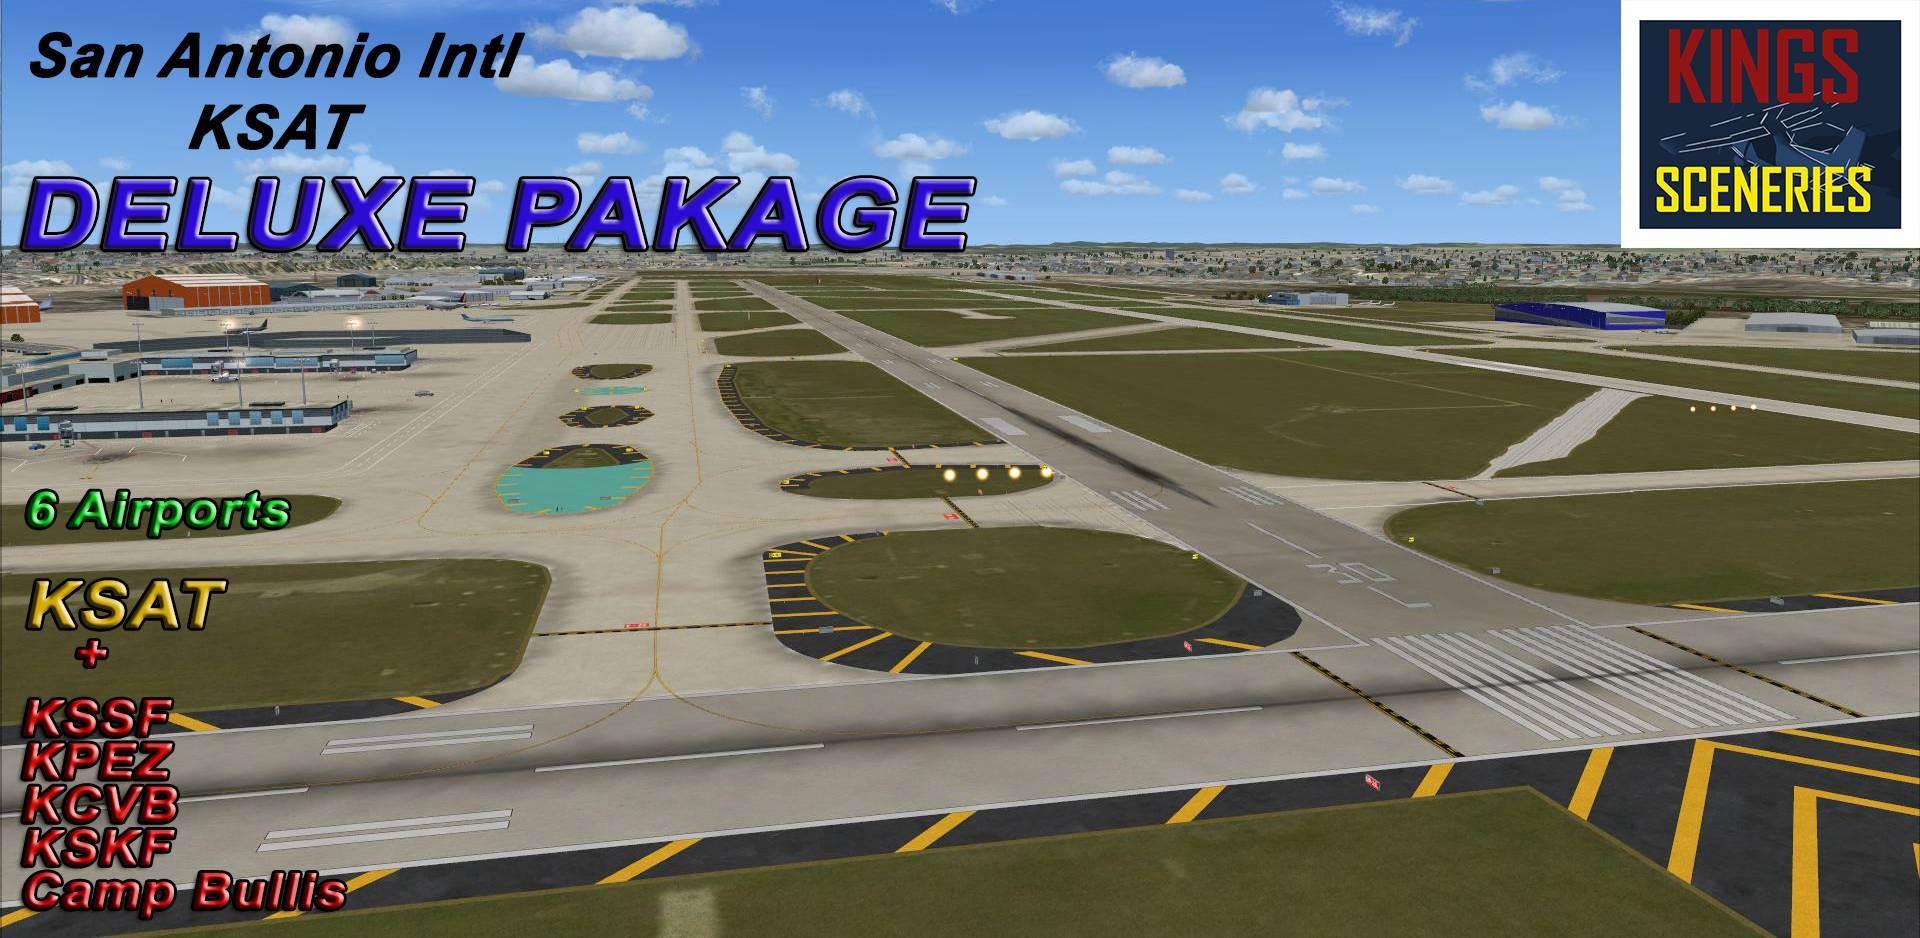 San Antonio International Airport (KSAT) Deluxe Package